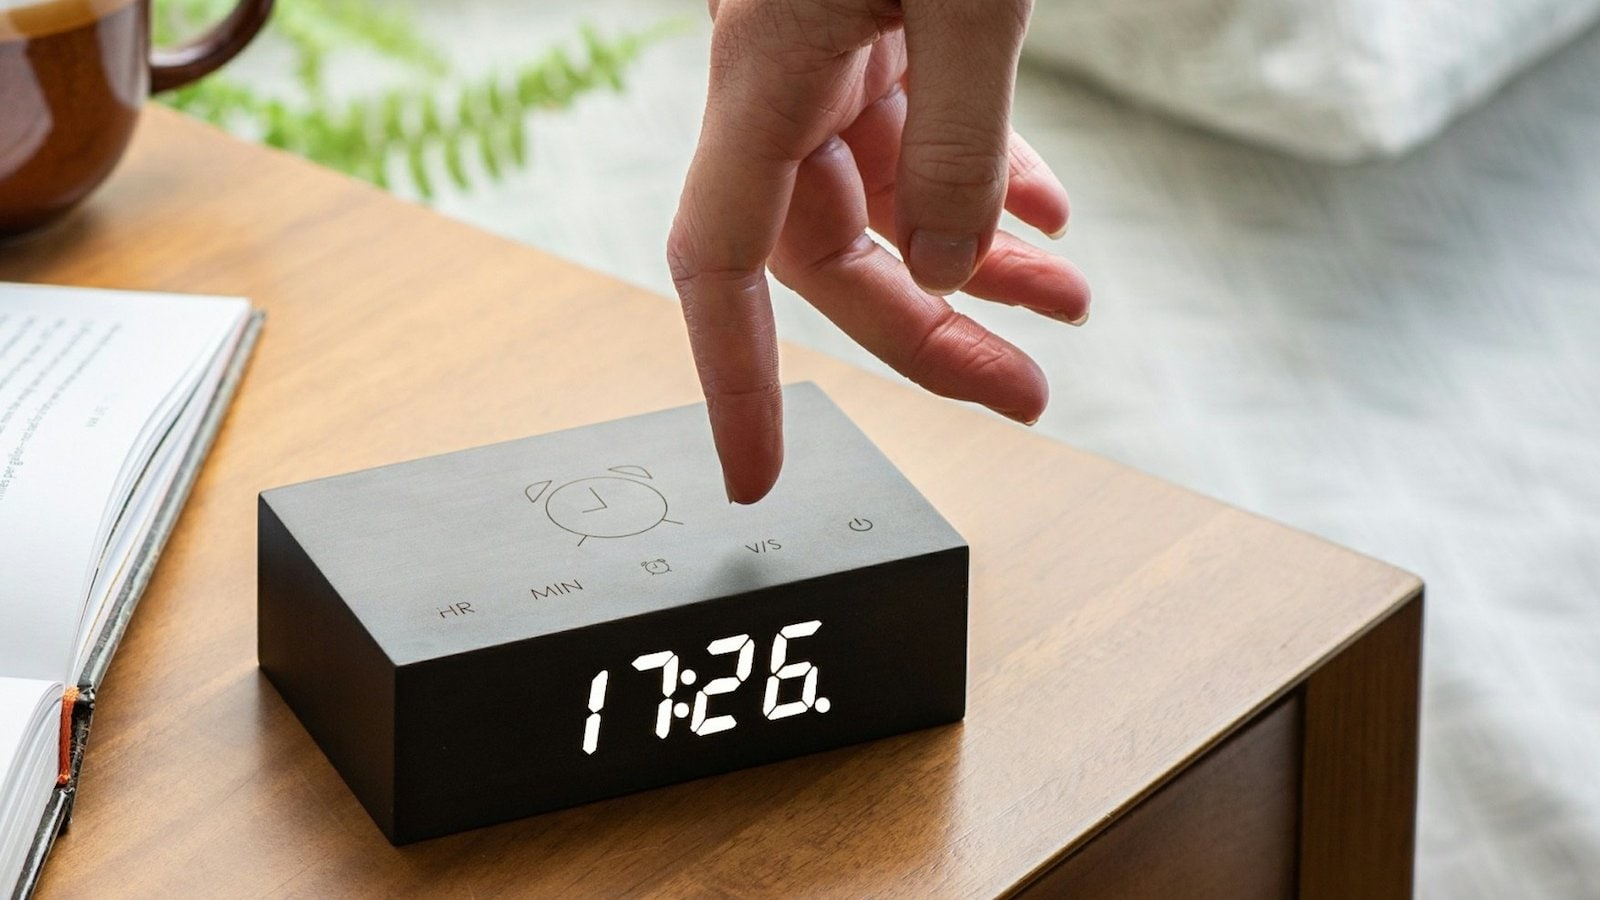 Gingko-Flip-Click-Clock-01.jpeg